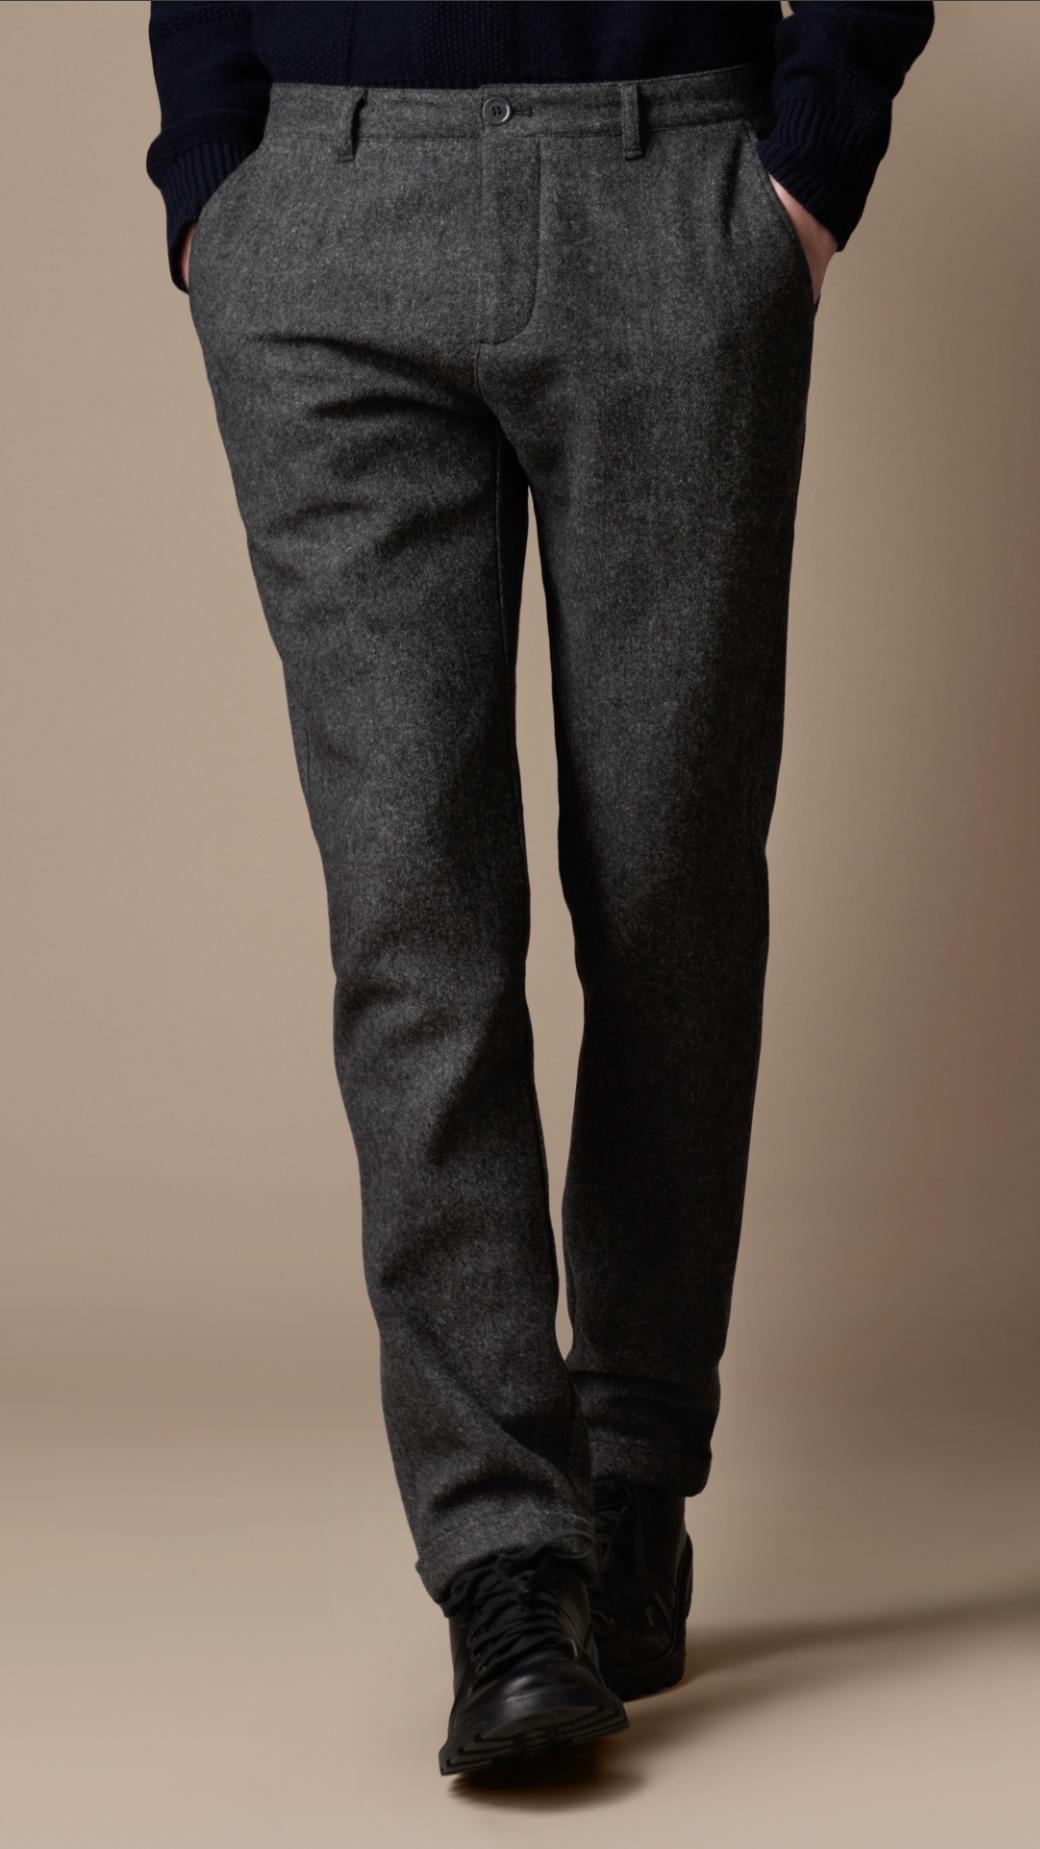 Burberry Brit Skinny Fit Wool Blend Trousers in Flint (Grey) for Men